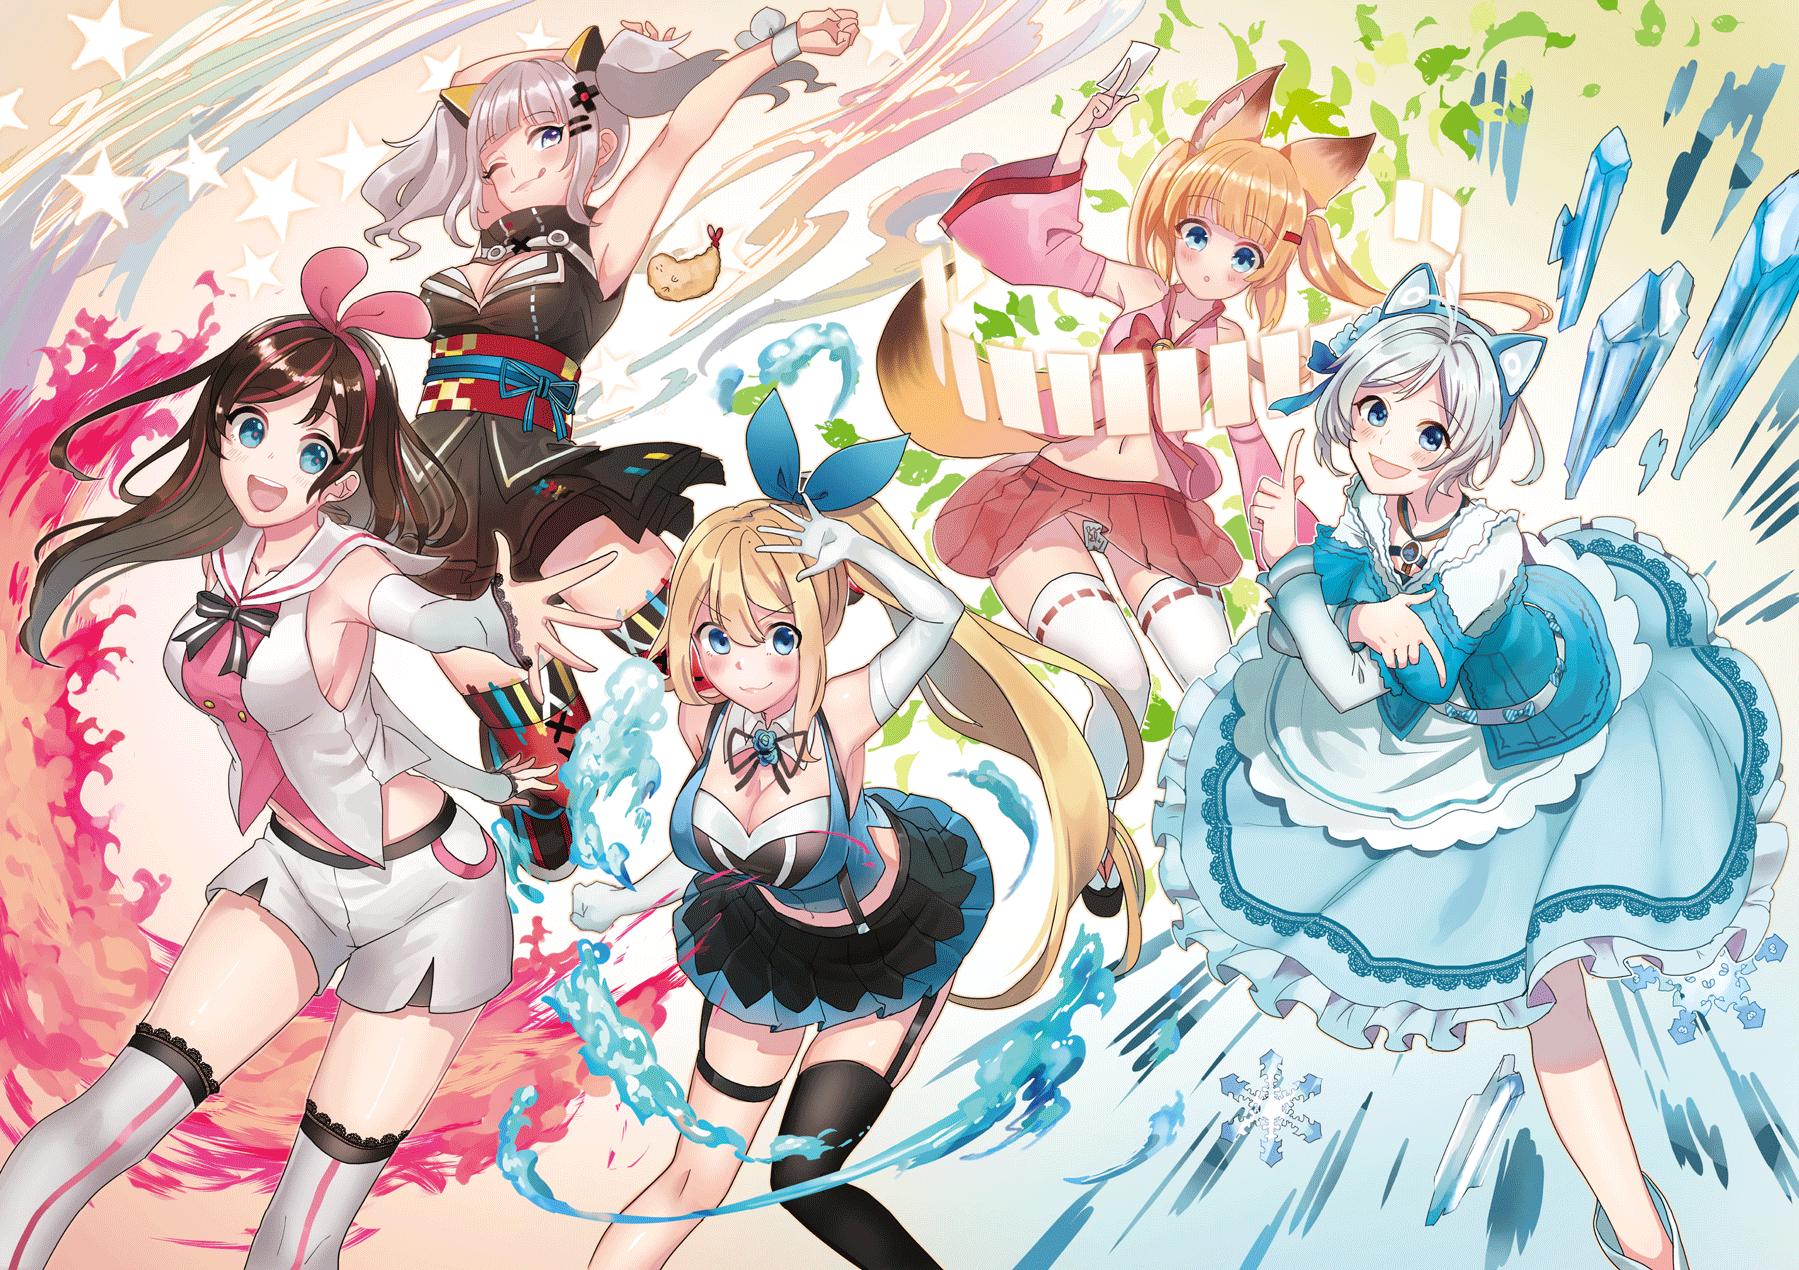 Anime 1799x1270 anime girls anime Virtual Youtuber Kizuna Ai Kaguya Luna blonde blue eyes miniskirt dress colorful dark hair open mouth animal ears